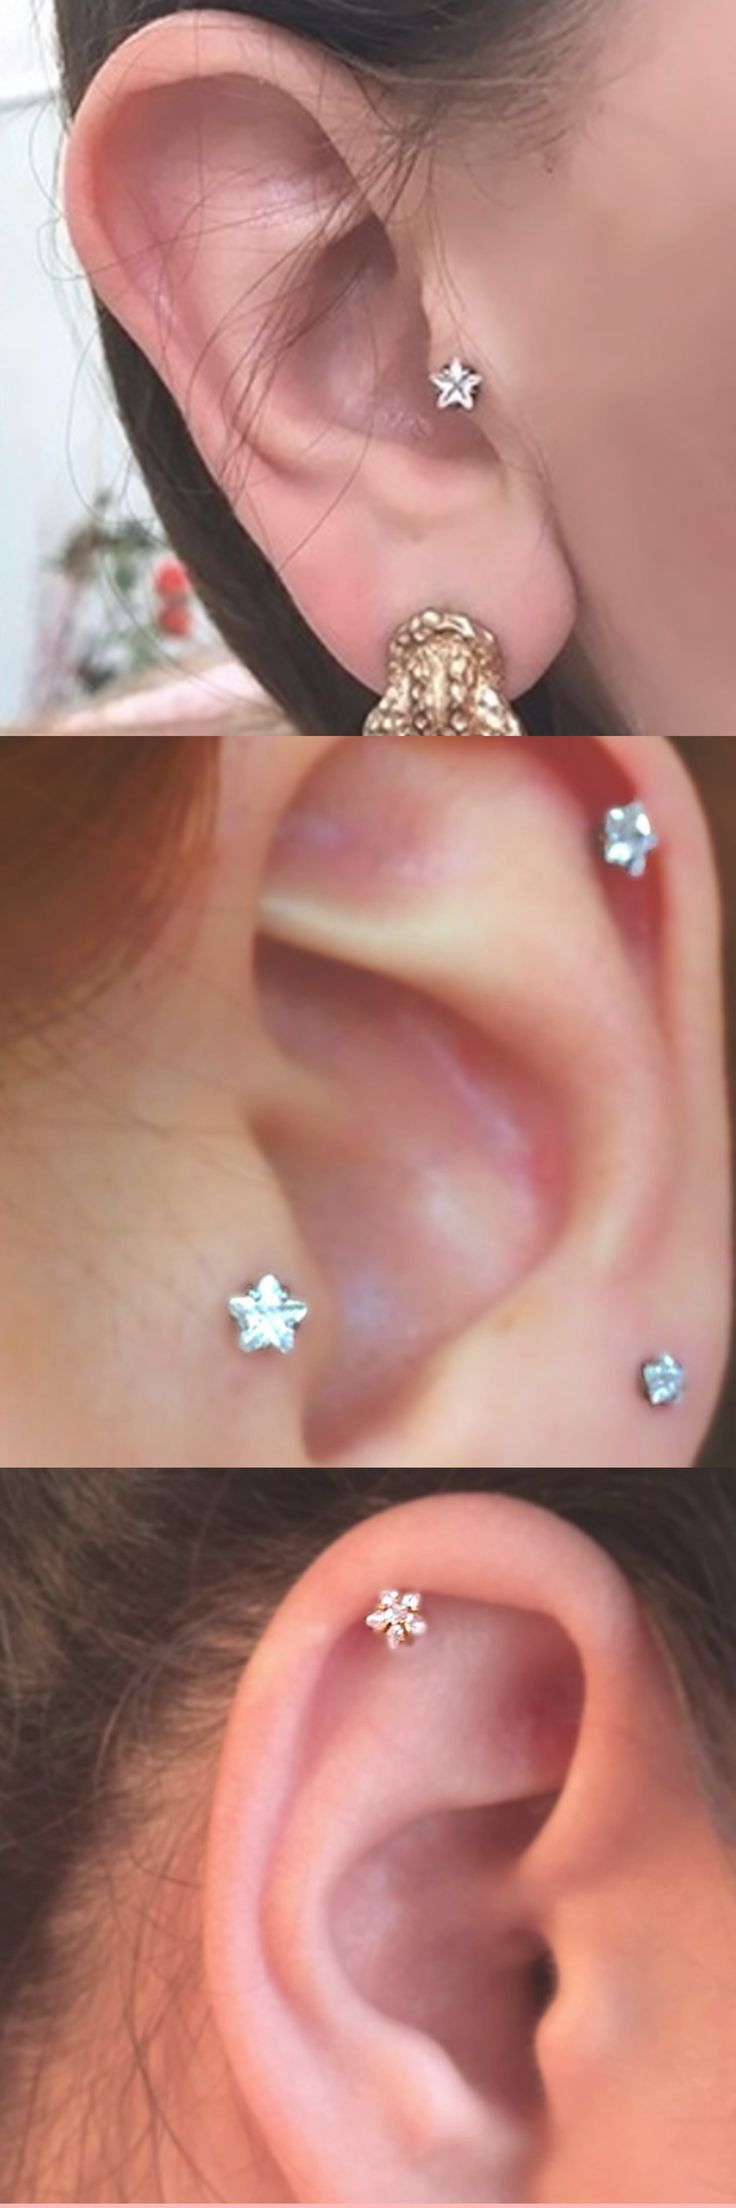 best 25+ cute cartilage piercing ideas on pinterest | cartilage